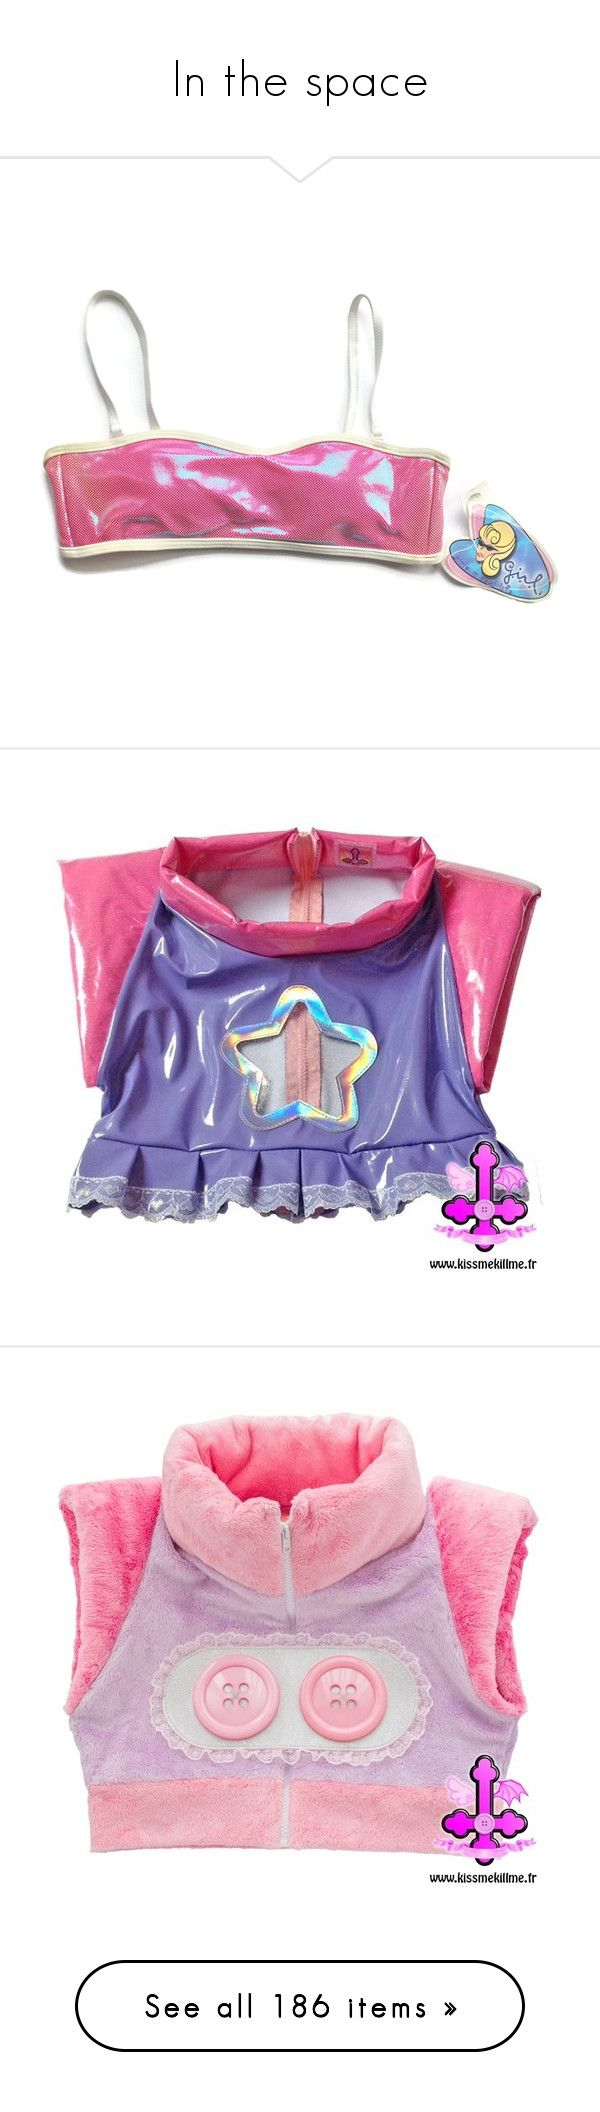 """In the space"" by hachi13 ❤ liked on Polyvore featuring swimwear, bikinis, bikini tops, strappy bikini top, push up tankini top, strappy bikinis, push up bikini tops, tops, vinyl top and zip top"